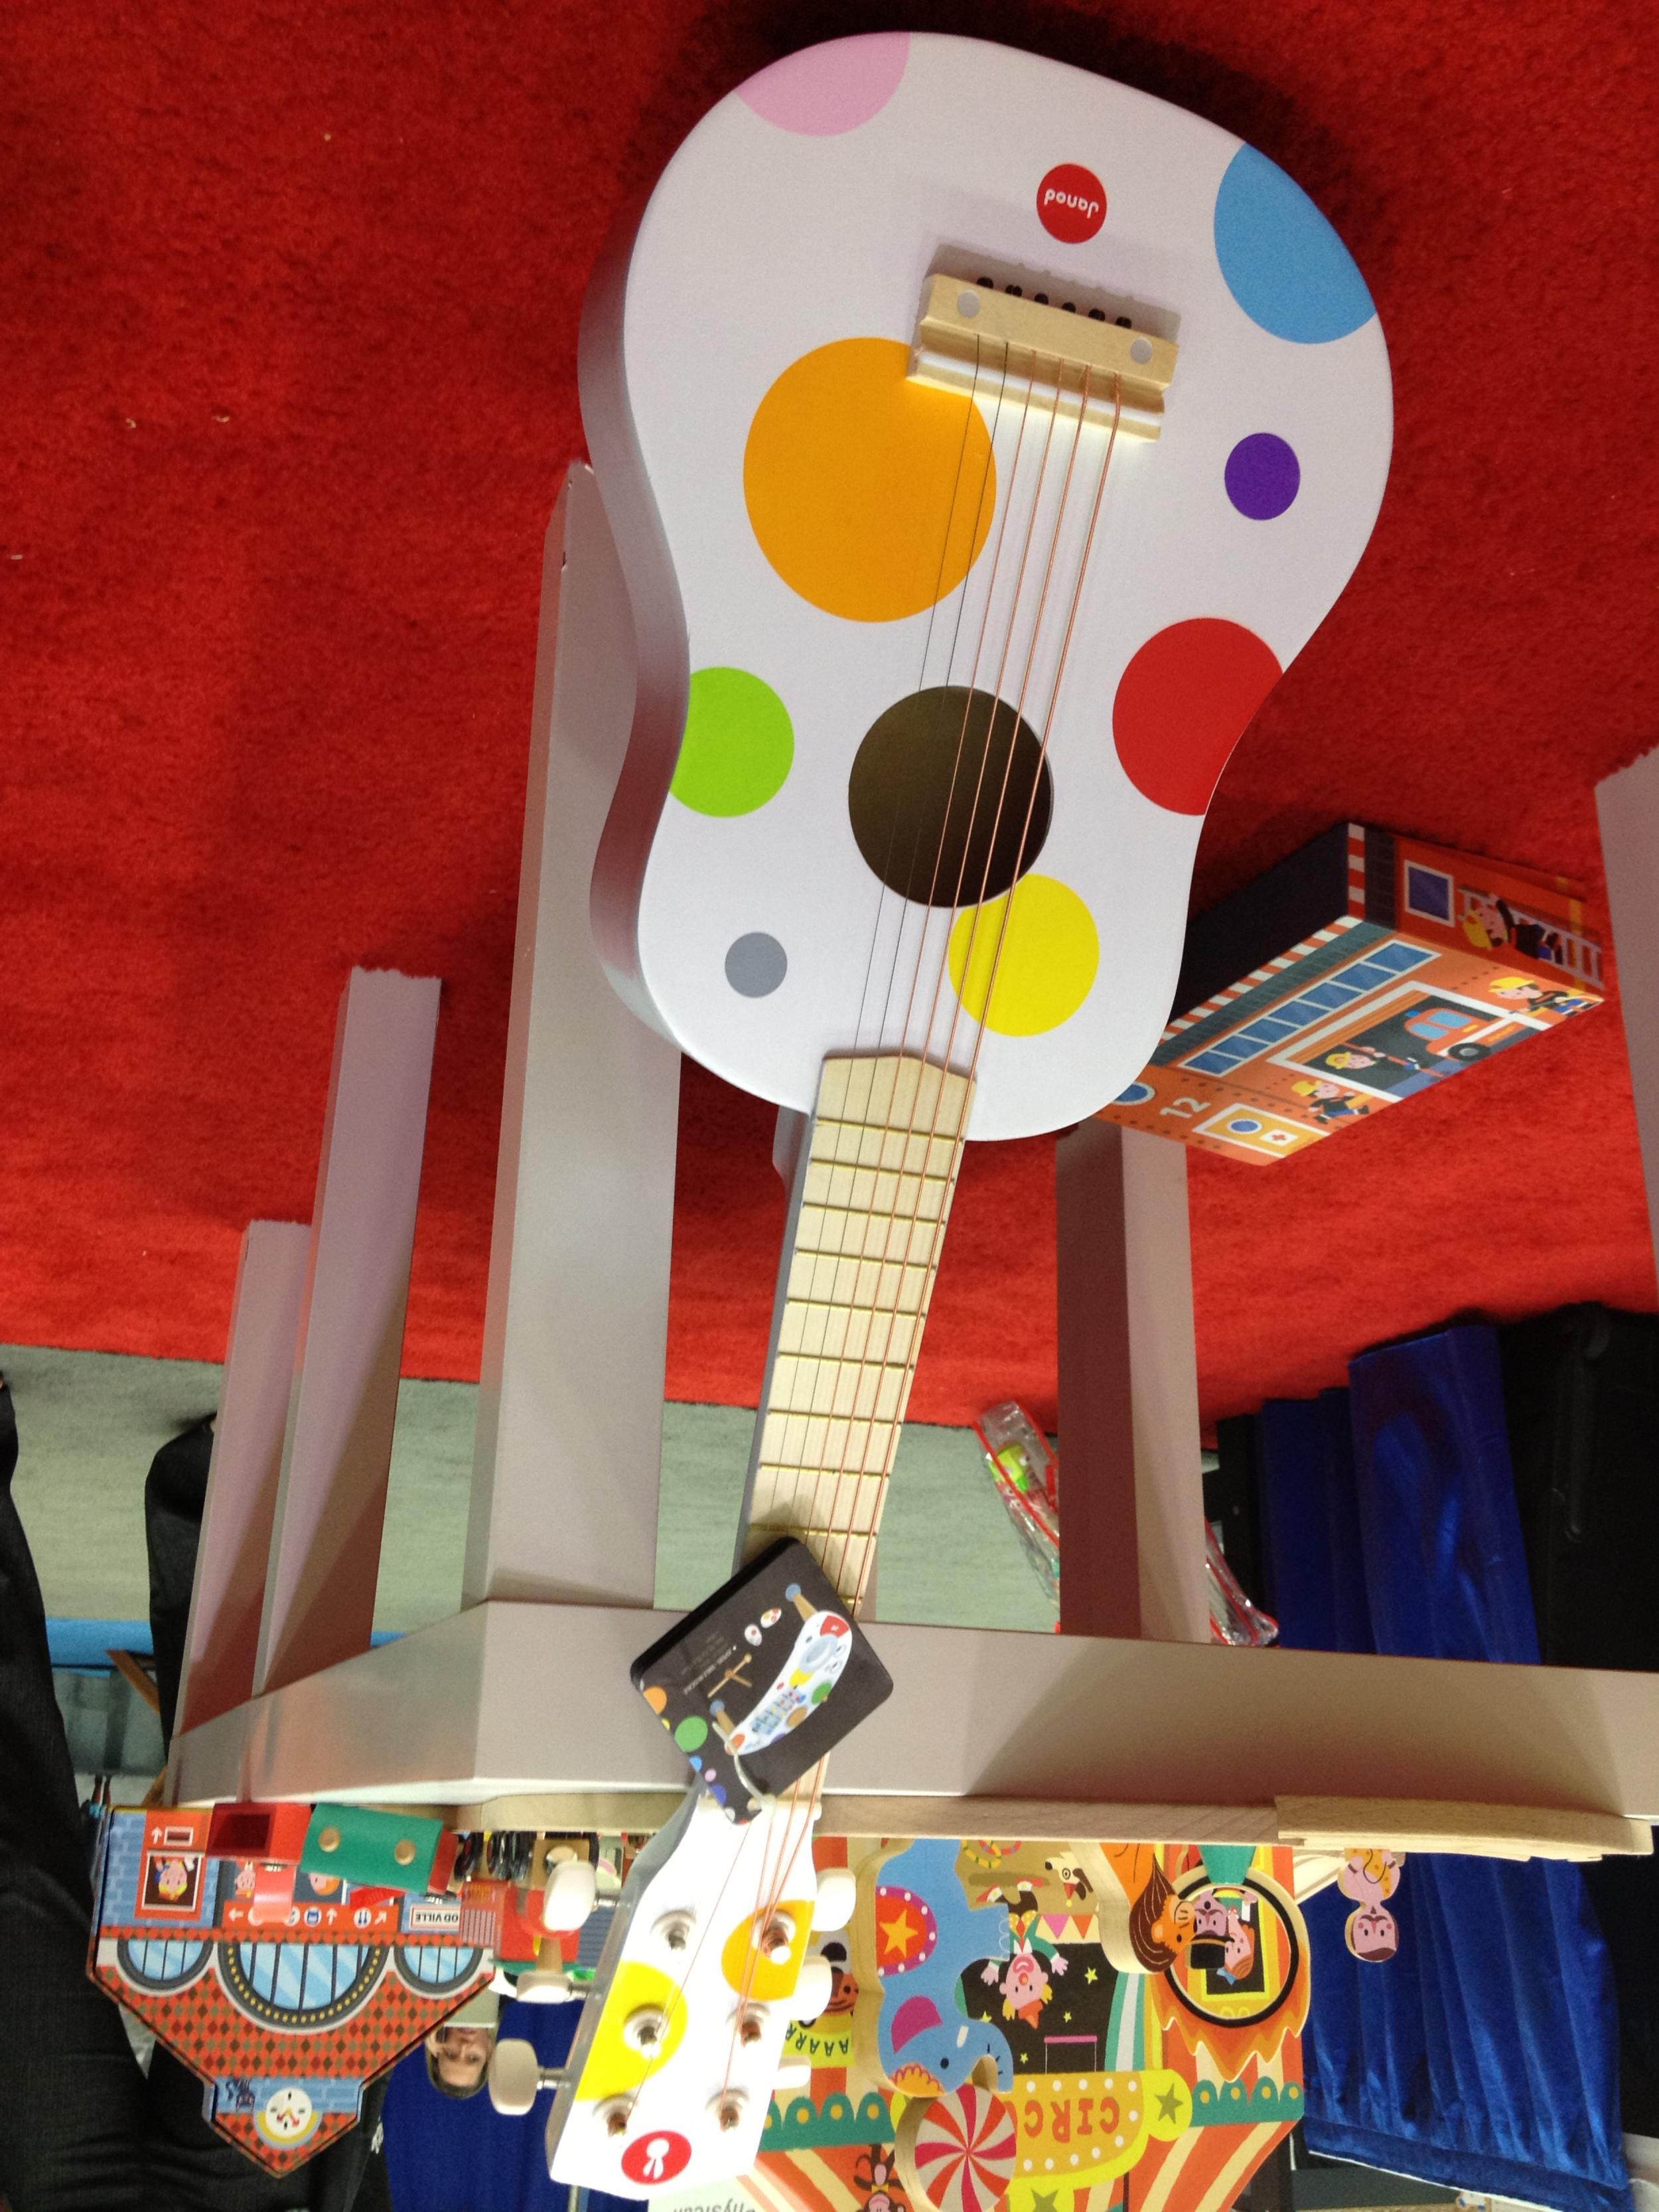 Portland_Toys_Janod_Polka_Dot_Guitar